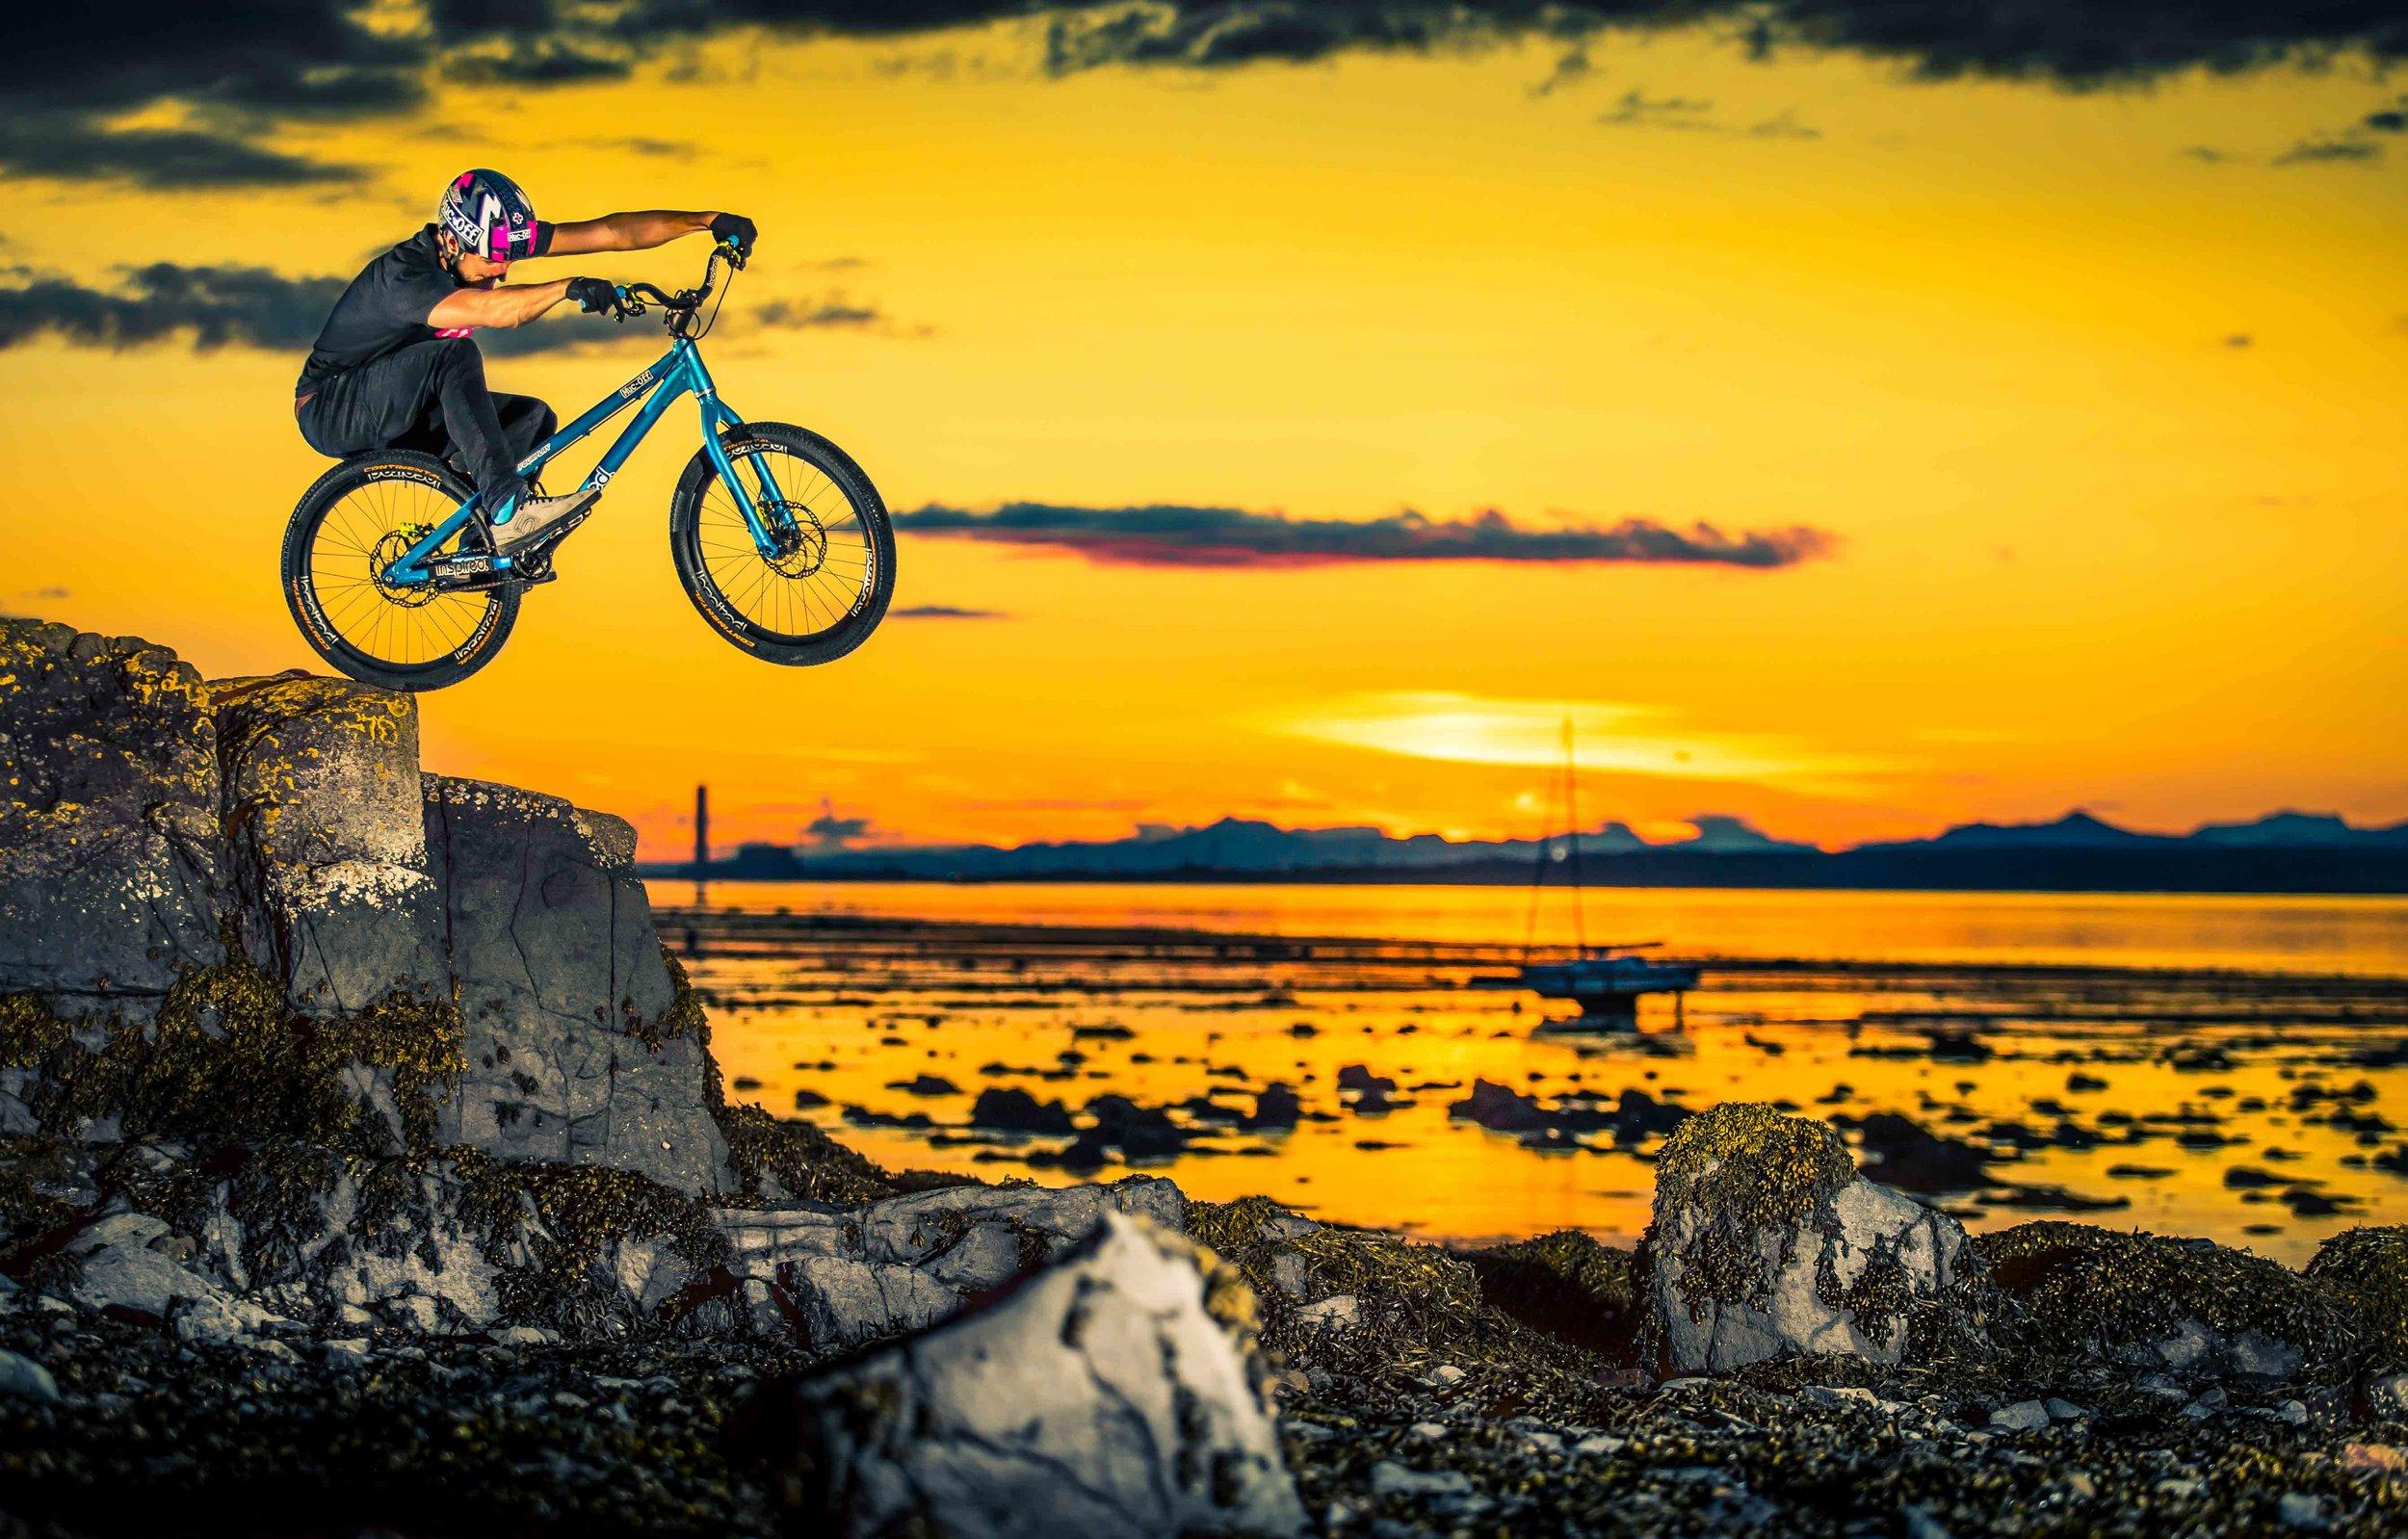 duncan-shaw-trials-bike-sunset.jpg